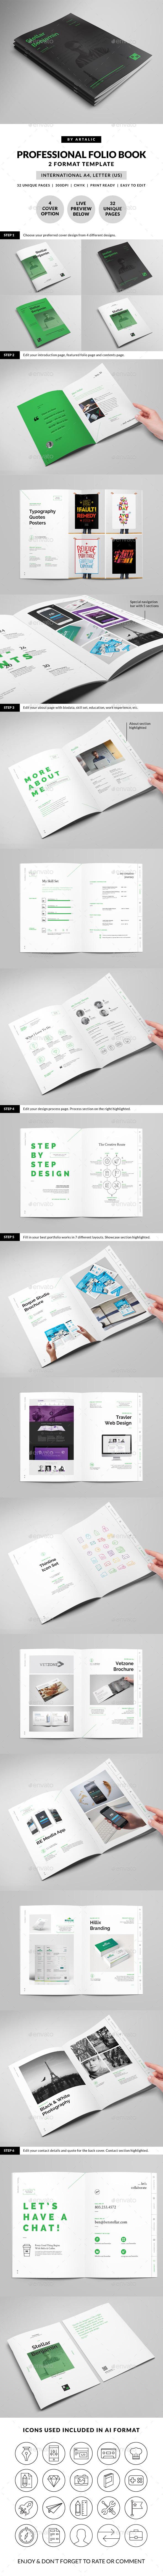 Stellar Portfolio - 32 Pages Booklet - Portfolio Brochures